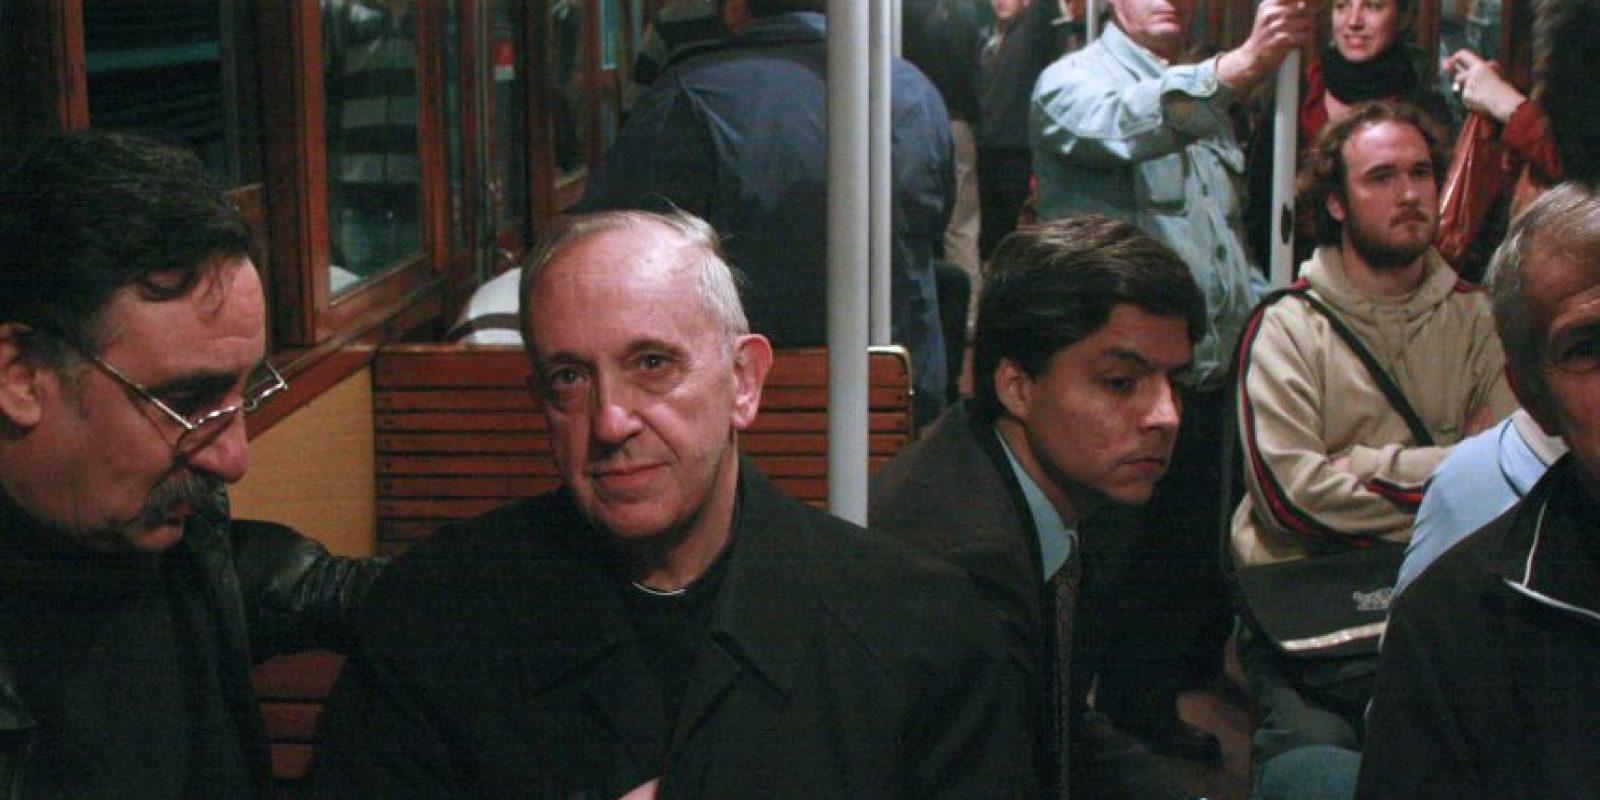 Foto:Prensa Asociada. Imagen Por: